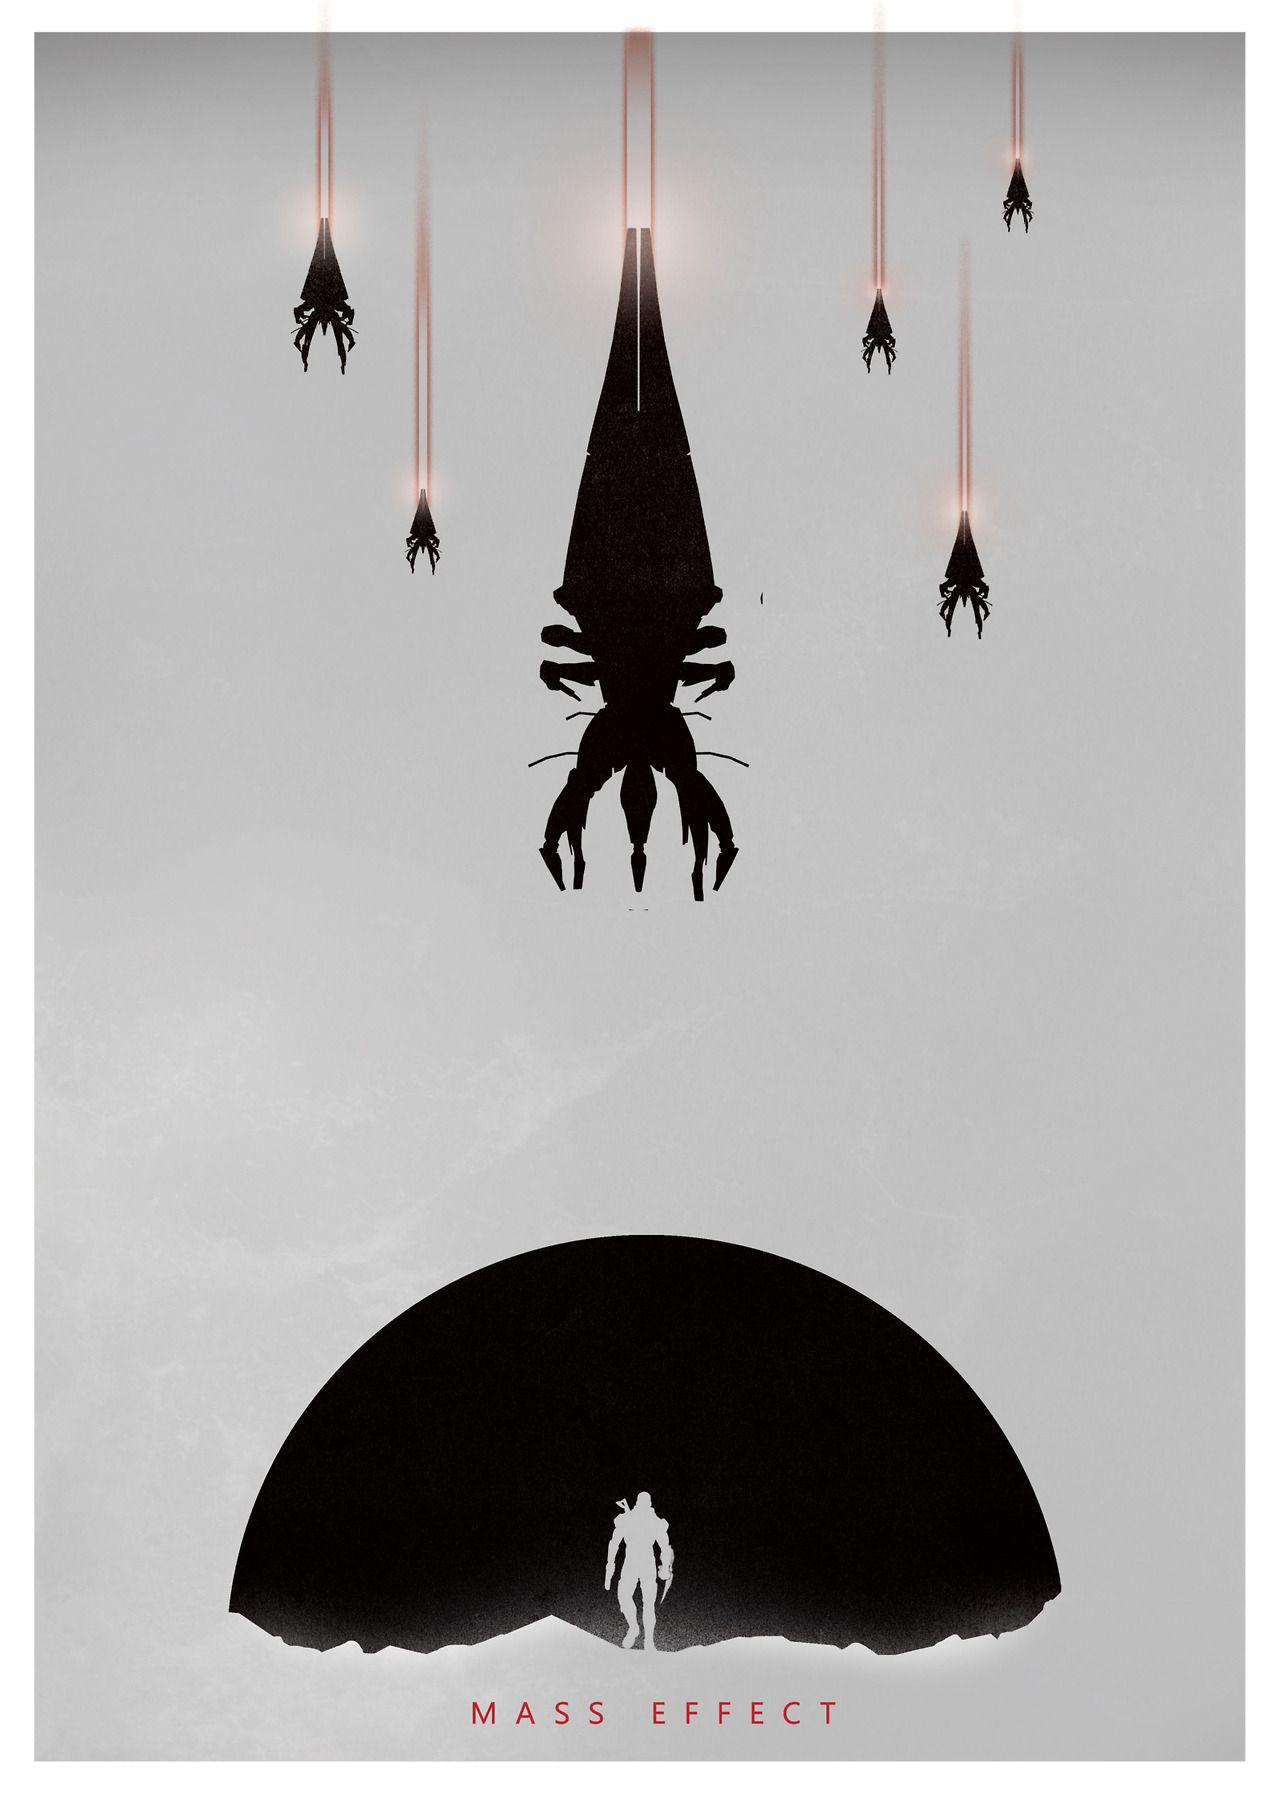 Mass Effect Poster - Created by GeekyNinja